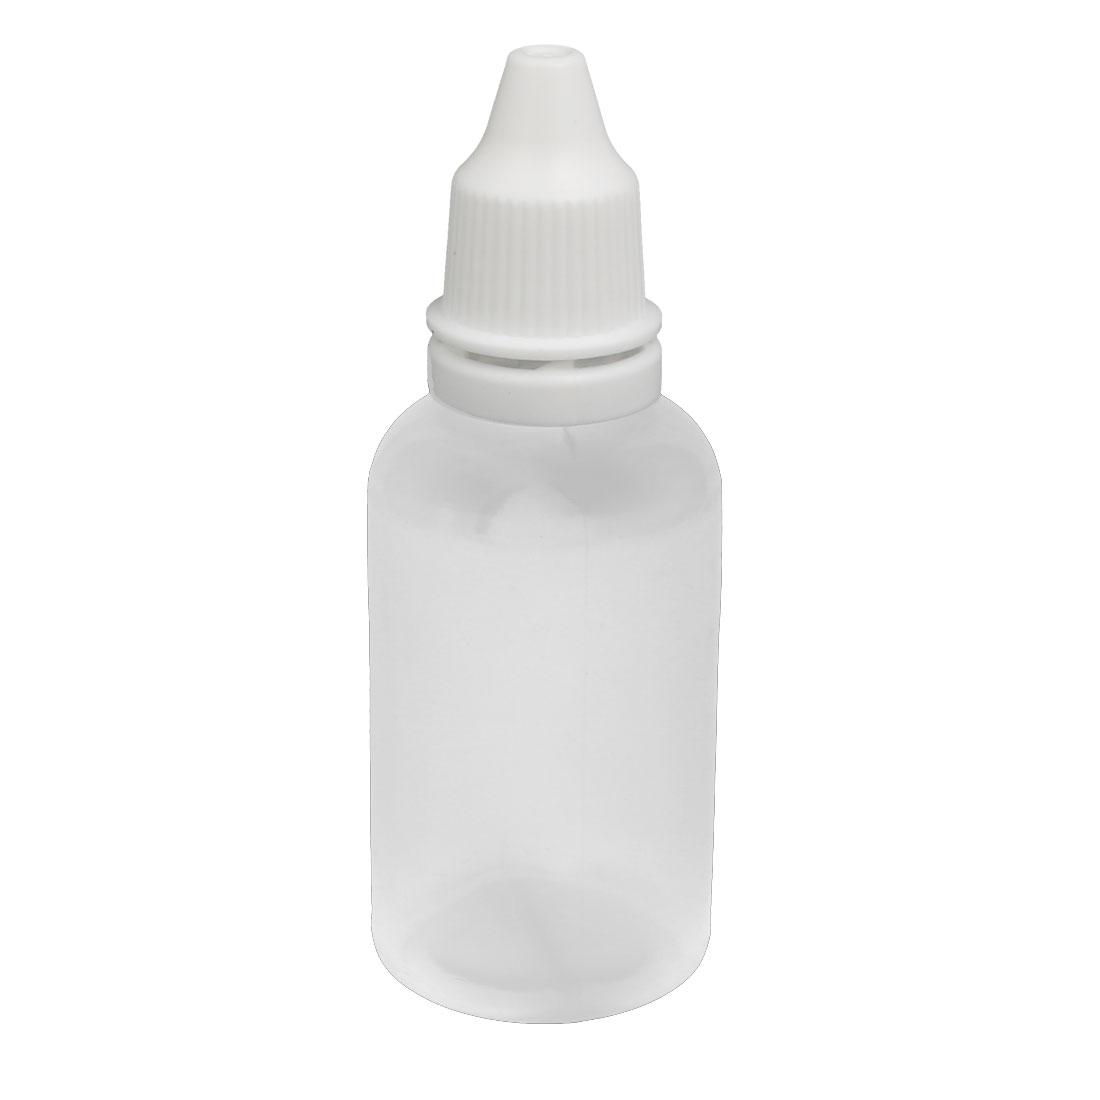 30ml PE Plastic Squeezable Dropper Dropping Bottle White Cap